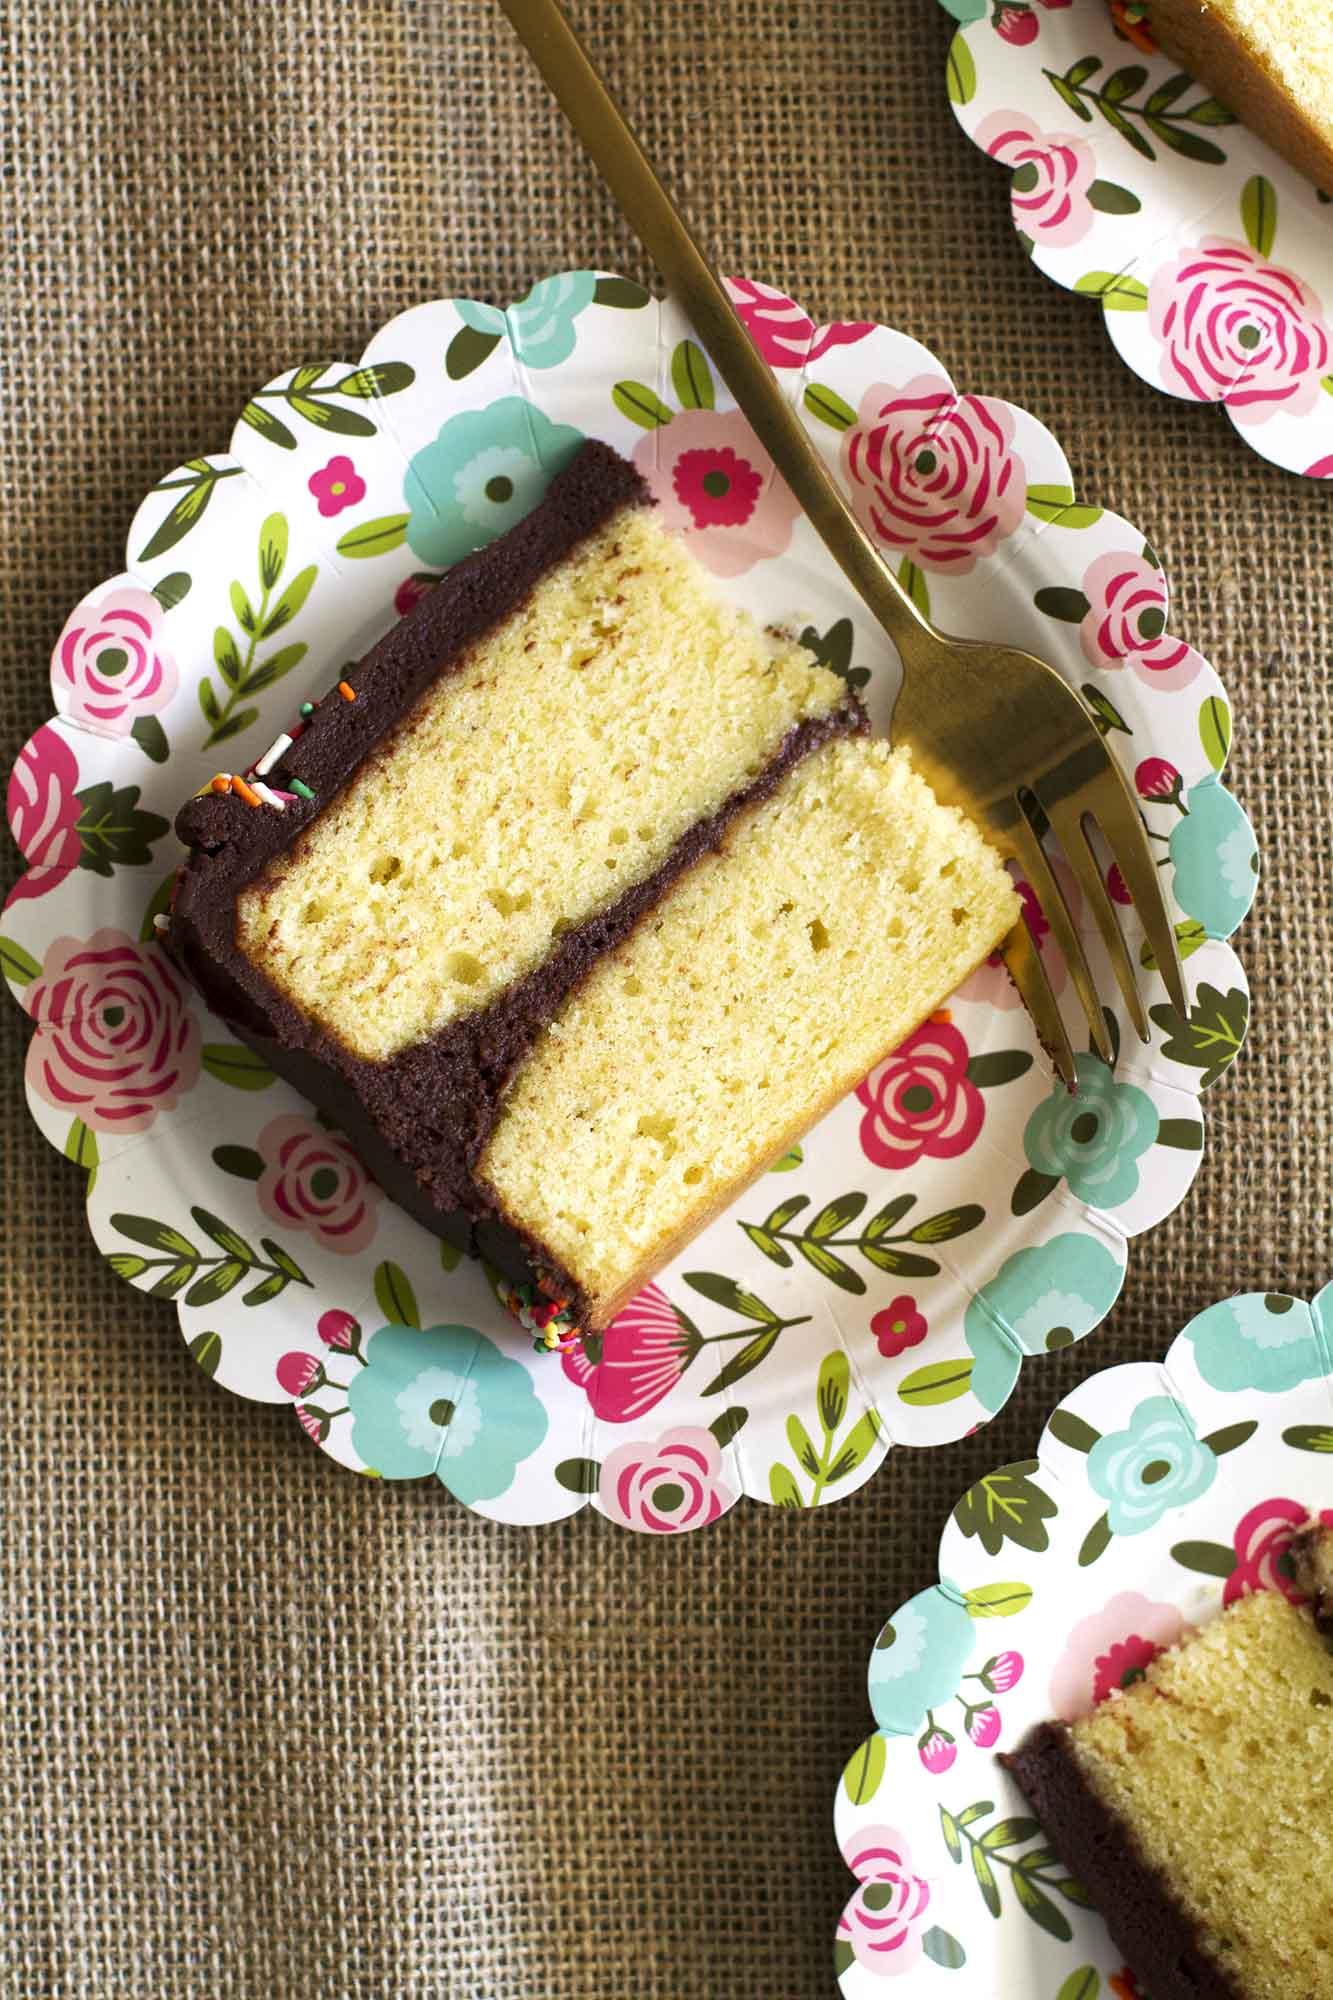 Yellow Birthday Cake with Chocolate Buttercream Frosting   girlversusdough.com @girlversusdough